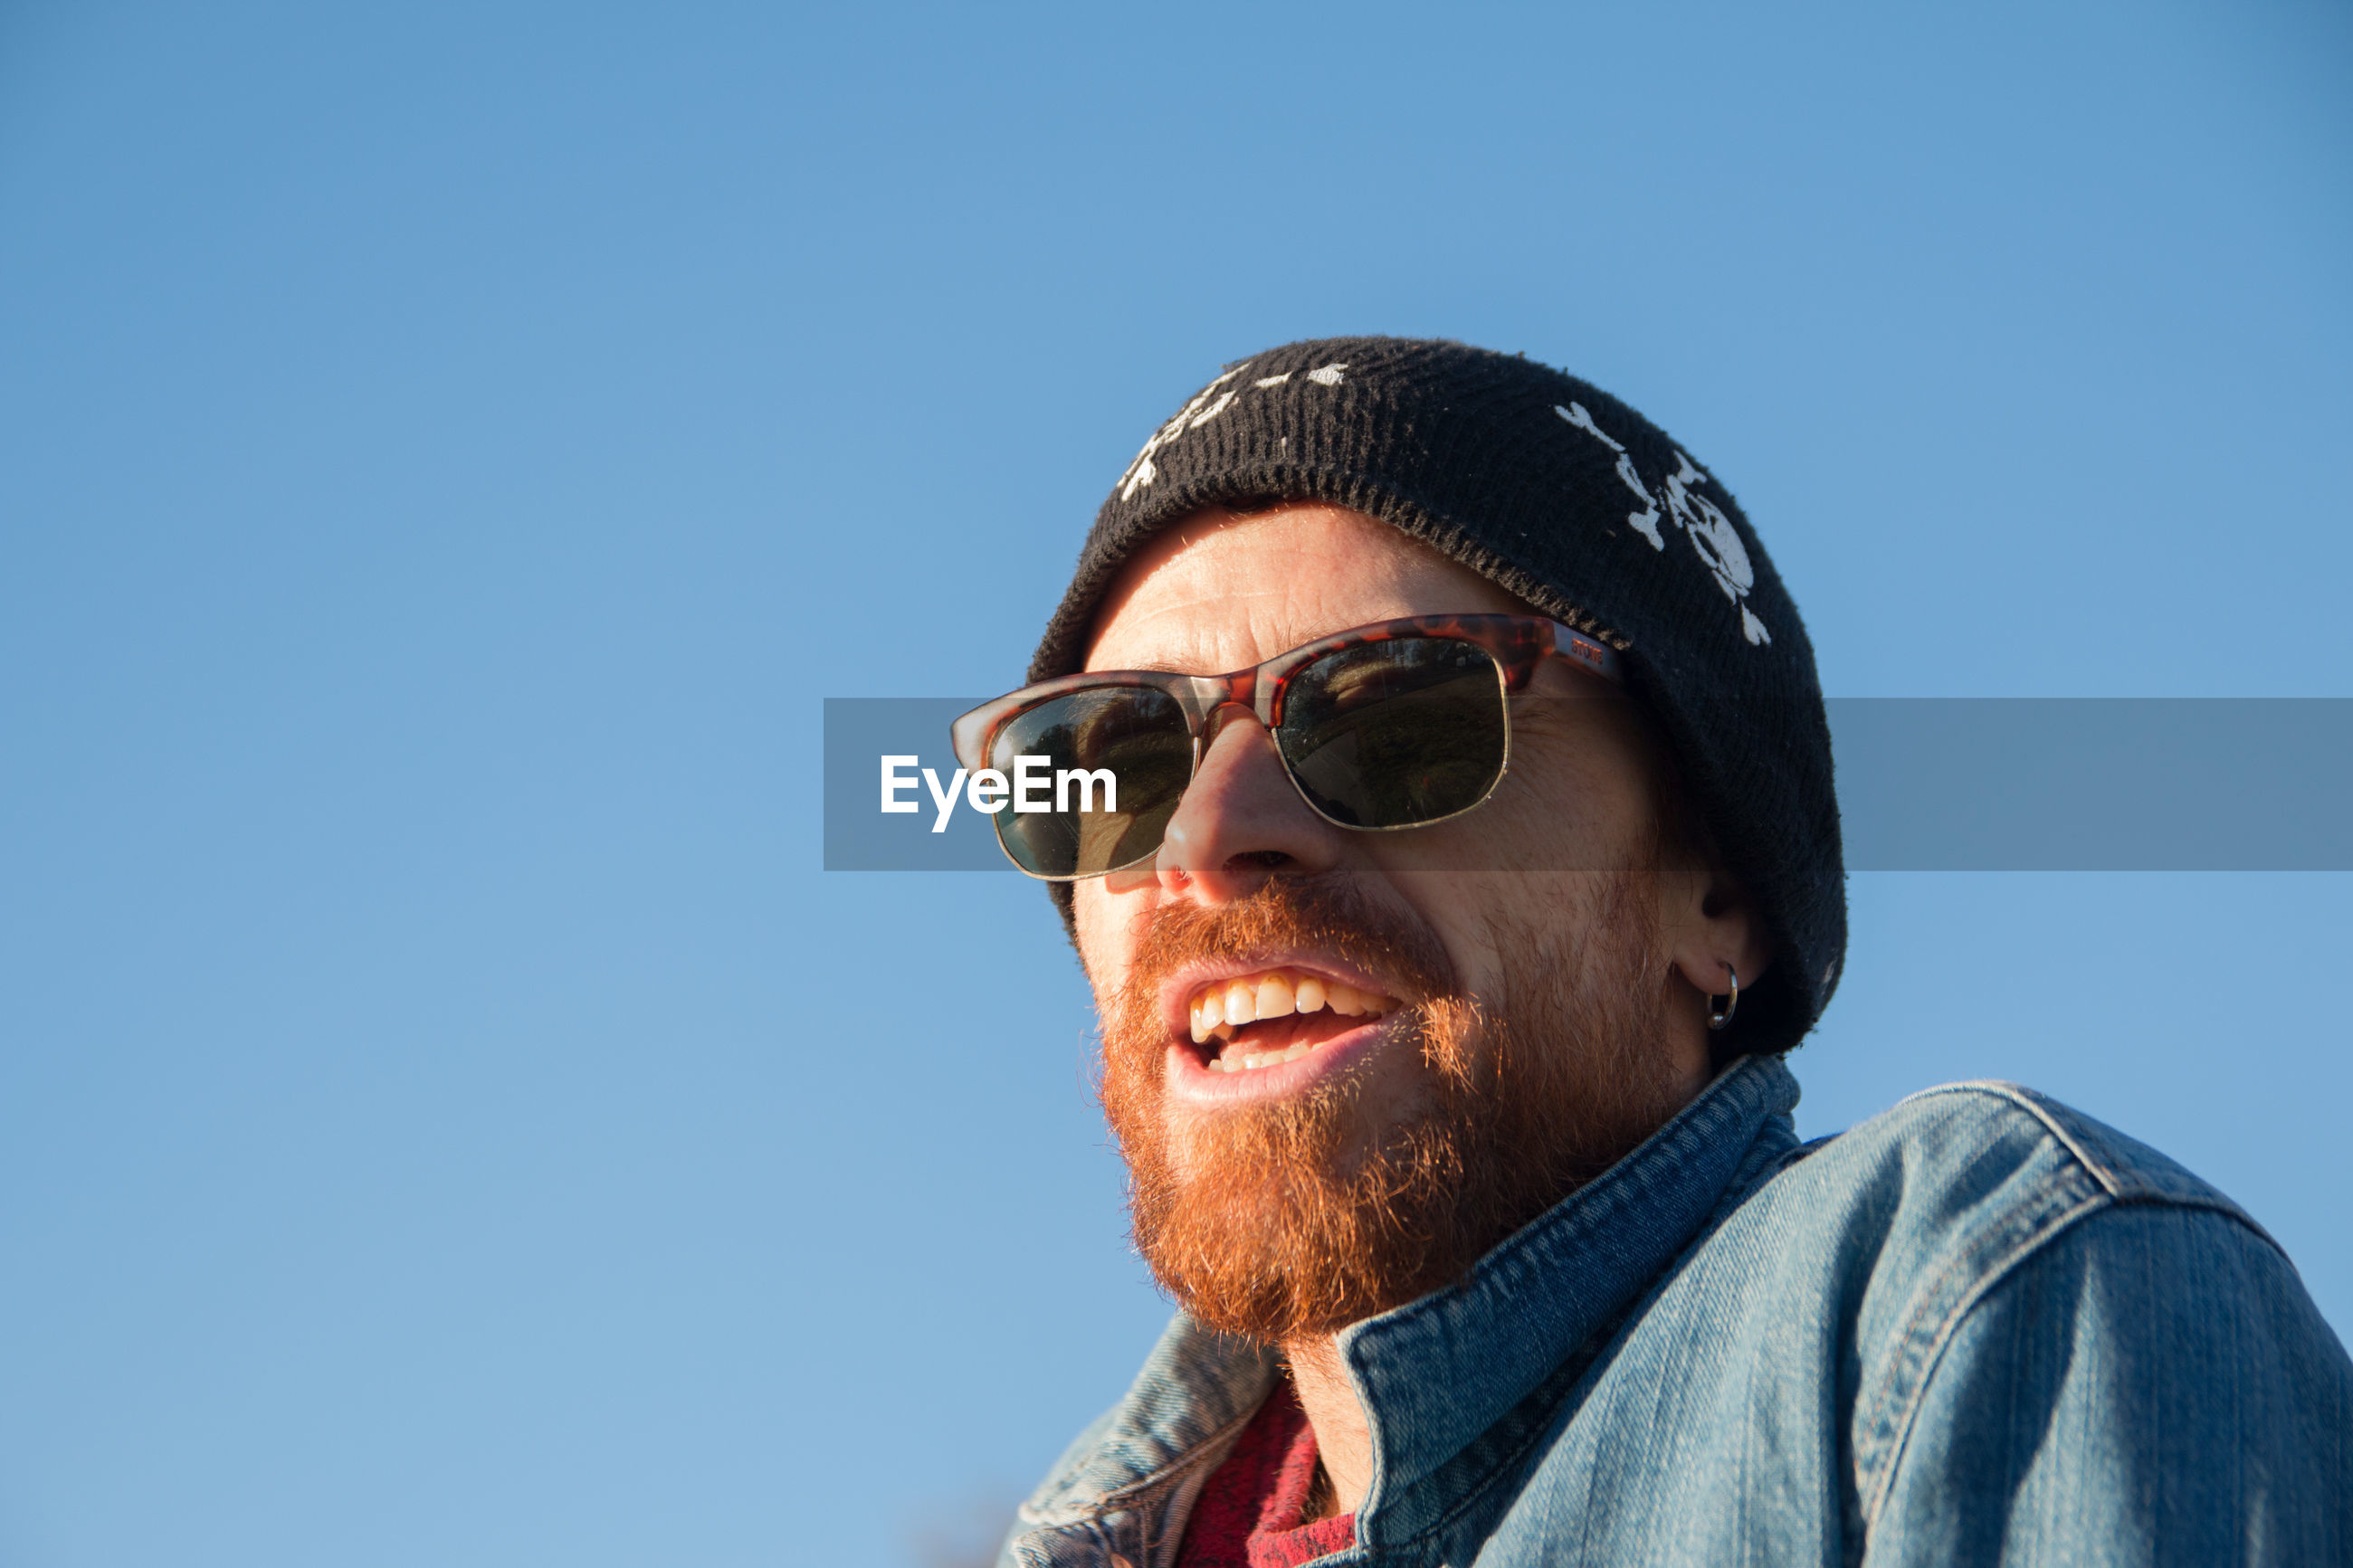 PORTRAIT OF MAN WEARING SUNGLASSES AGAINST BLUE SKY